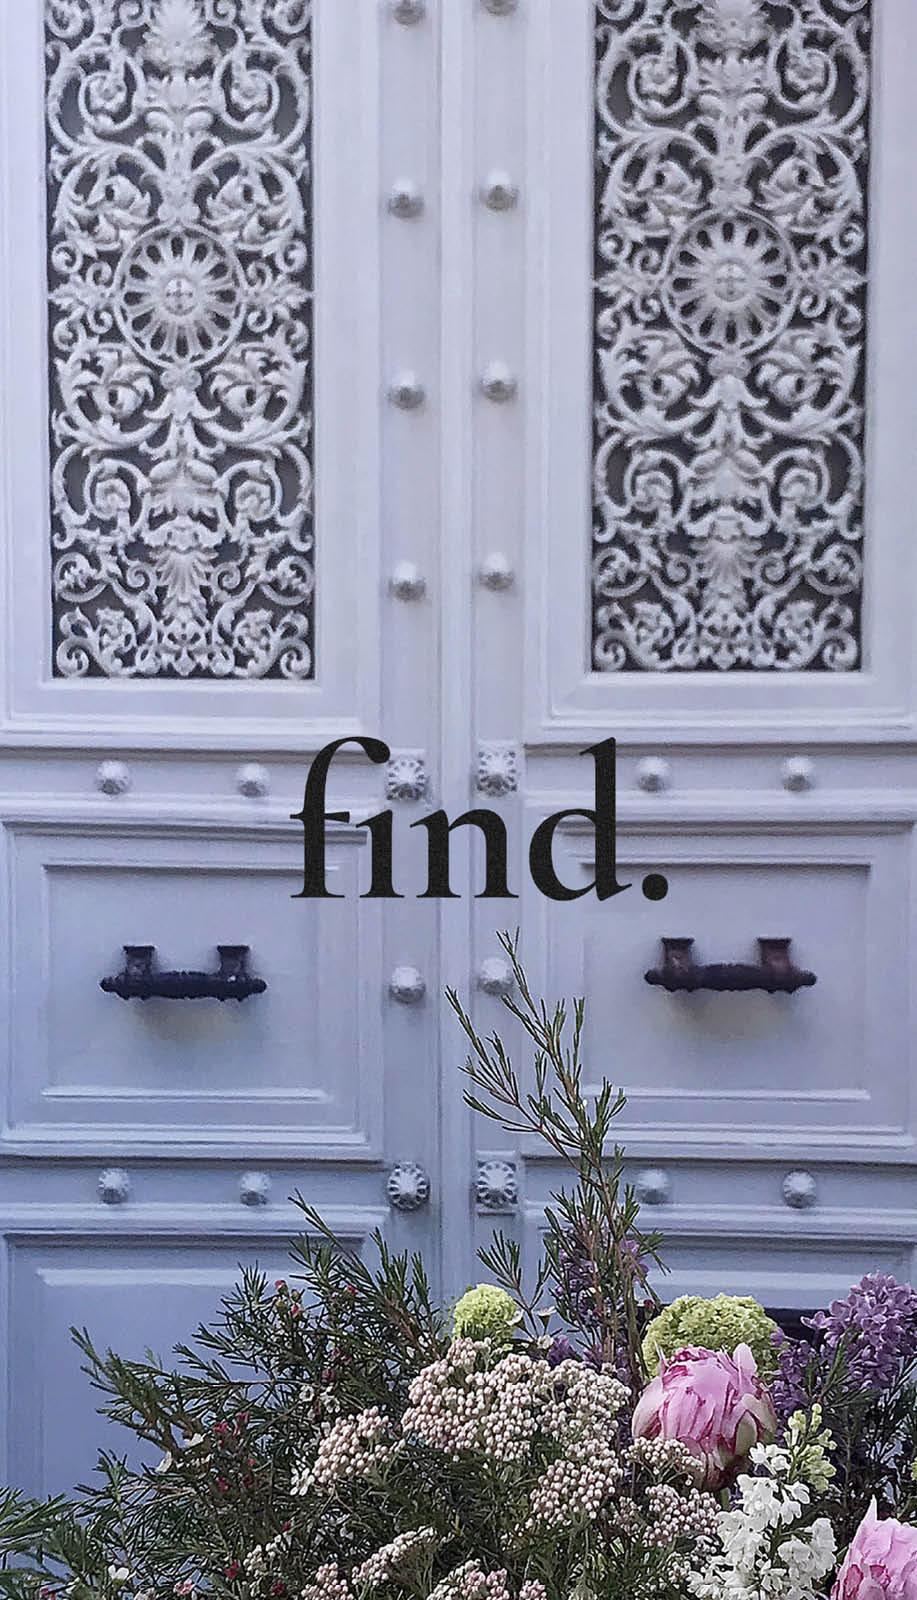 Seek_Find_Doors_-_Find_fmt